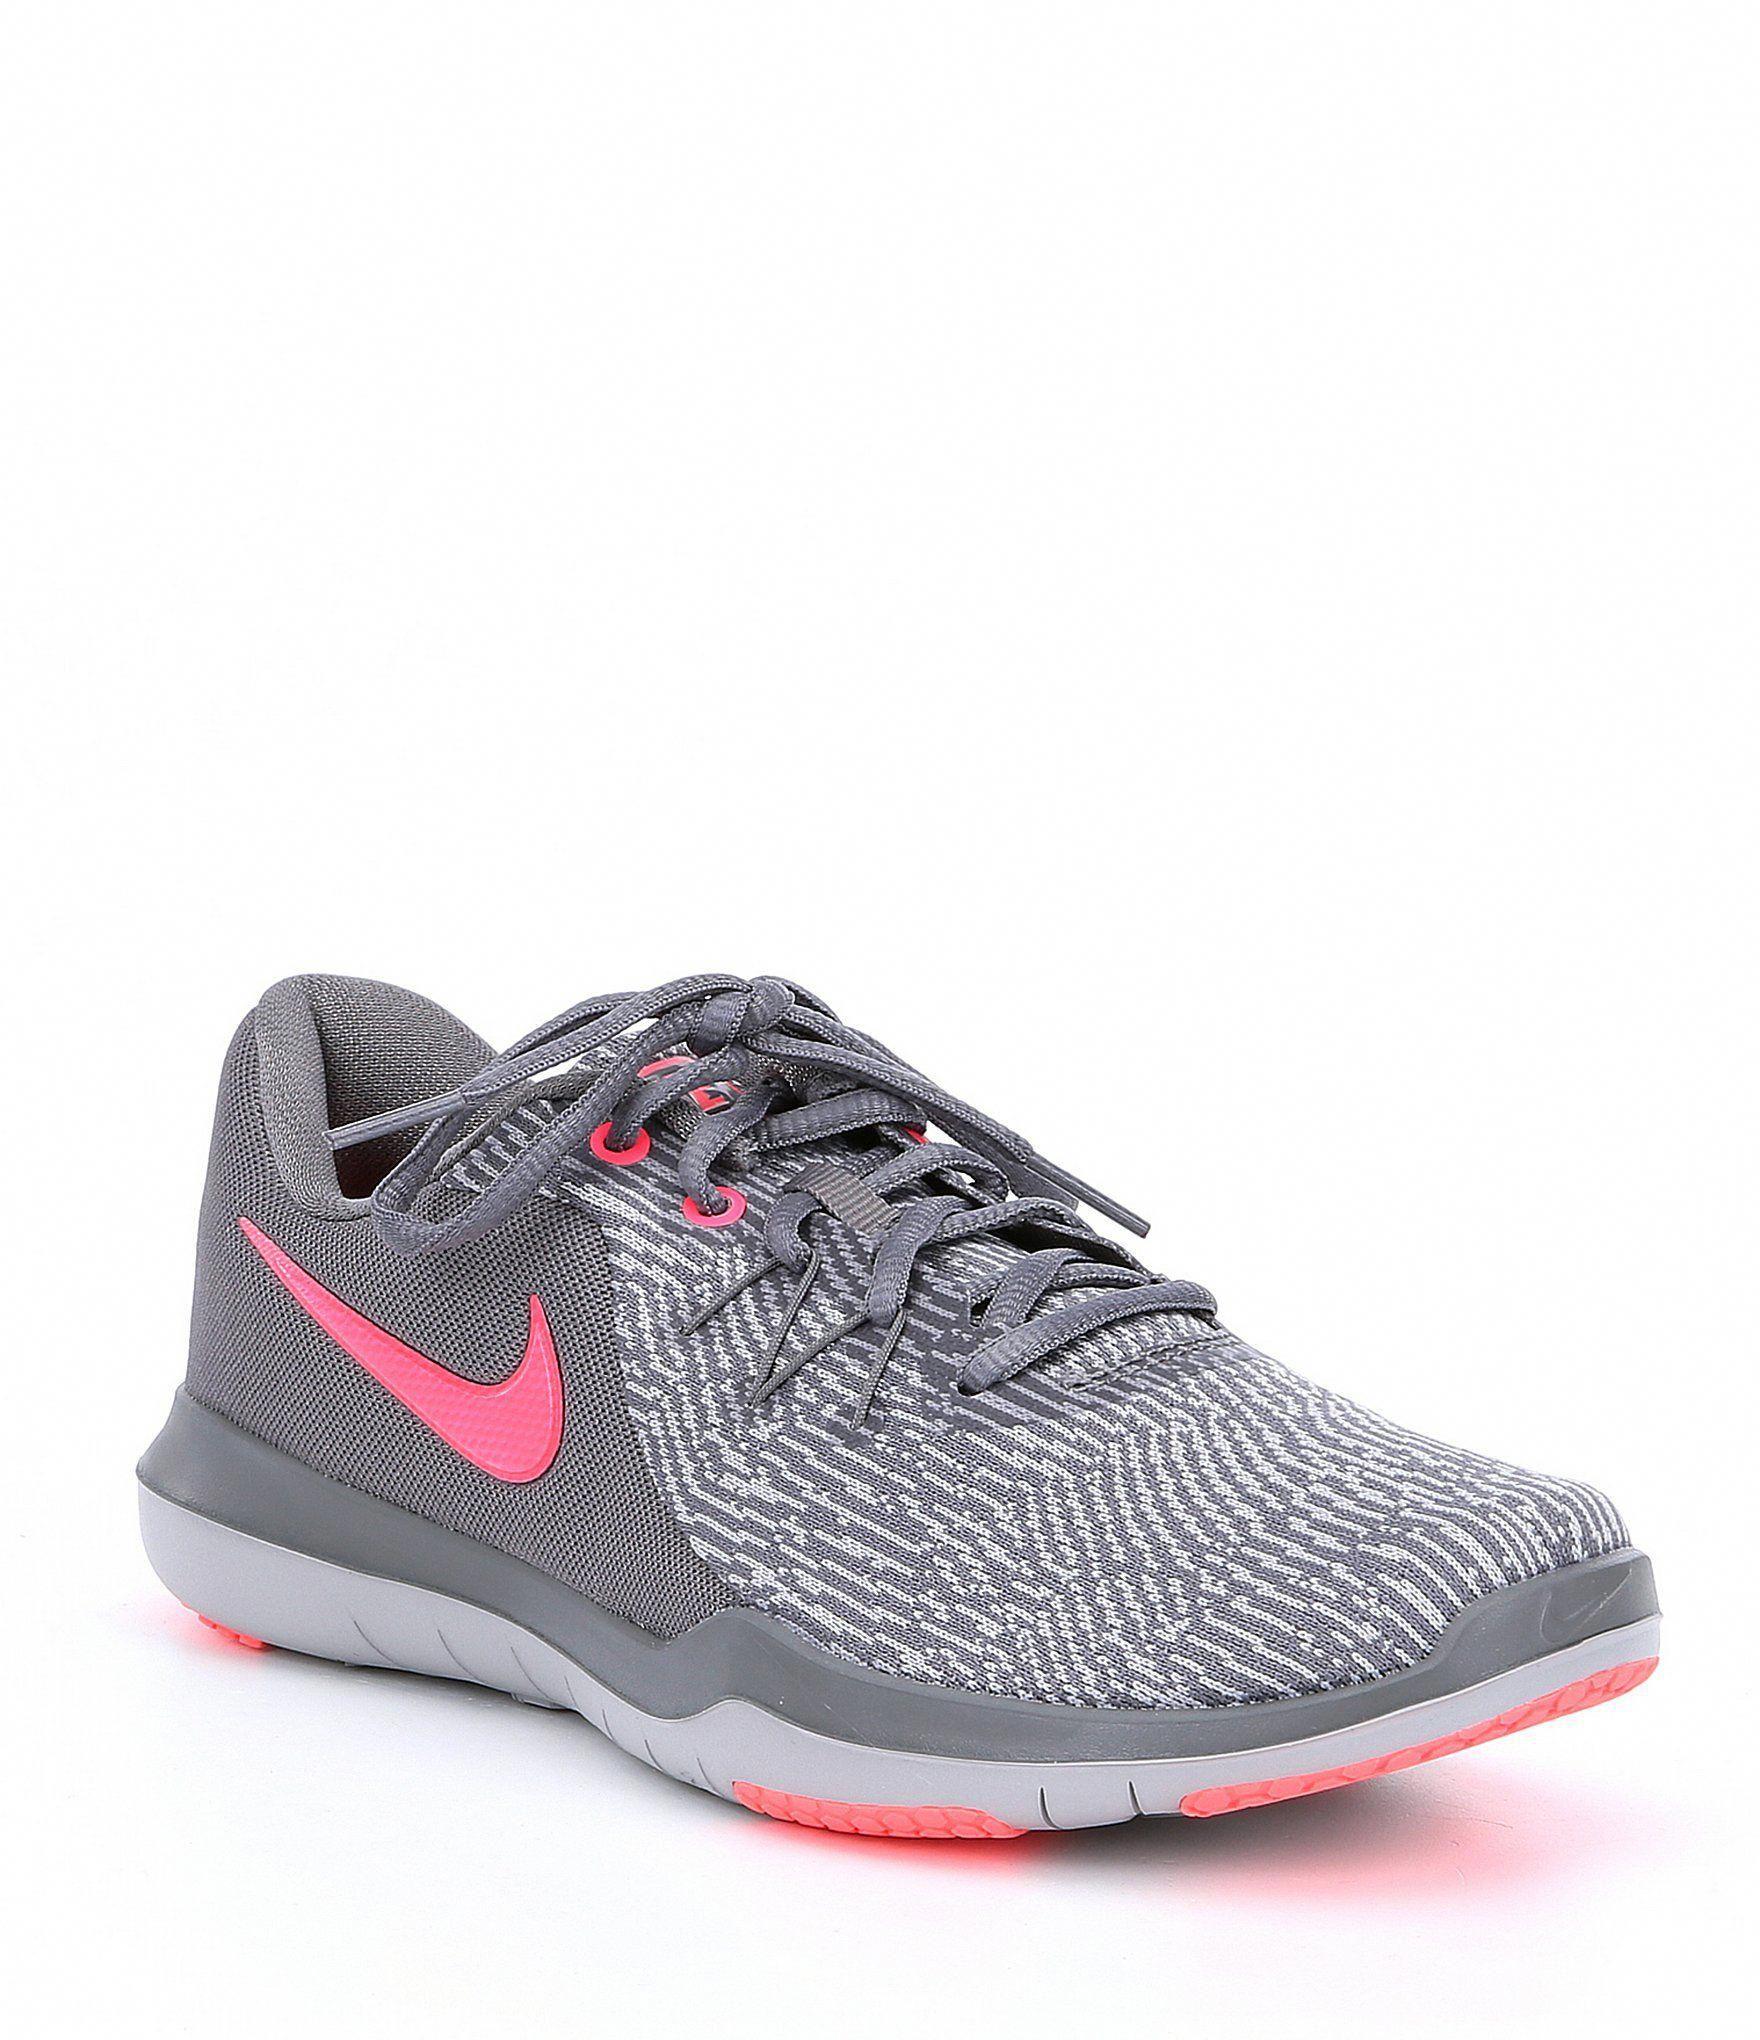 Nike Women's Flex Supreme TR 6 Trainer